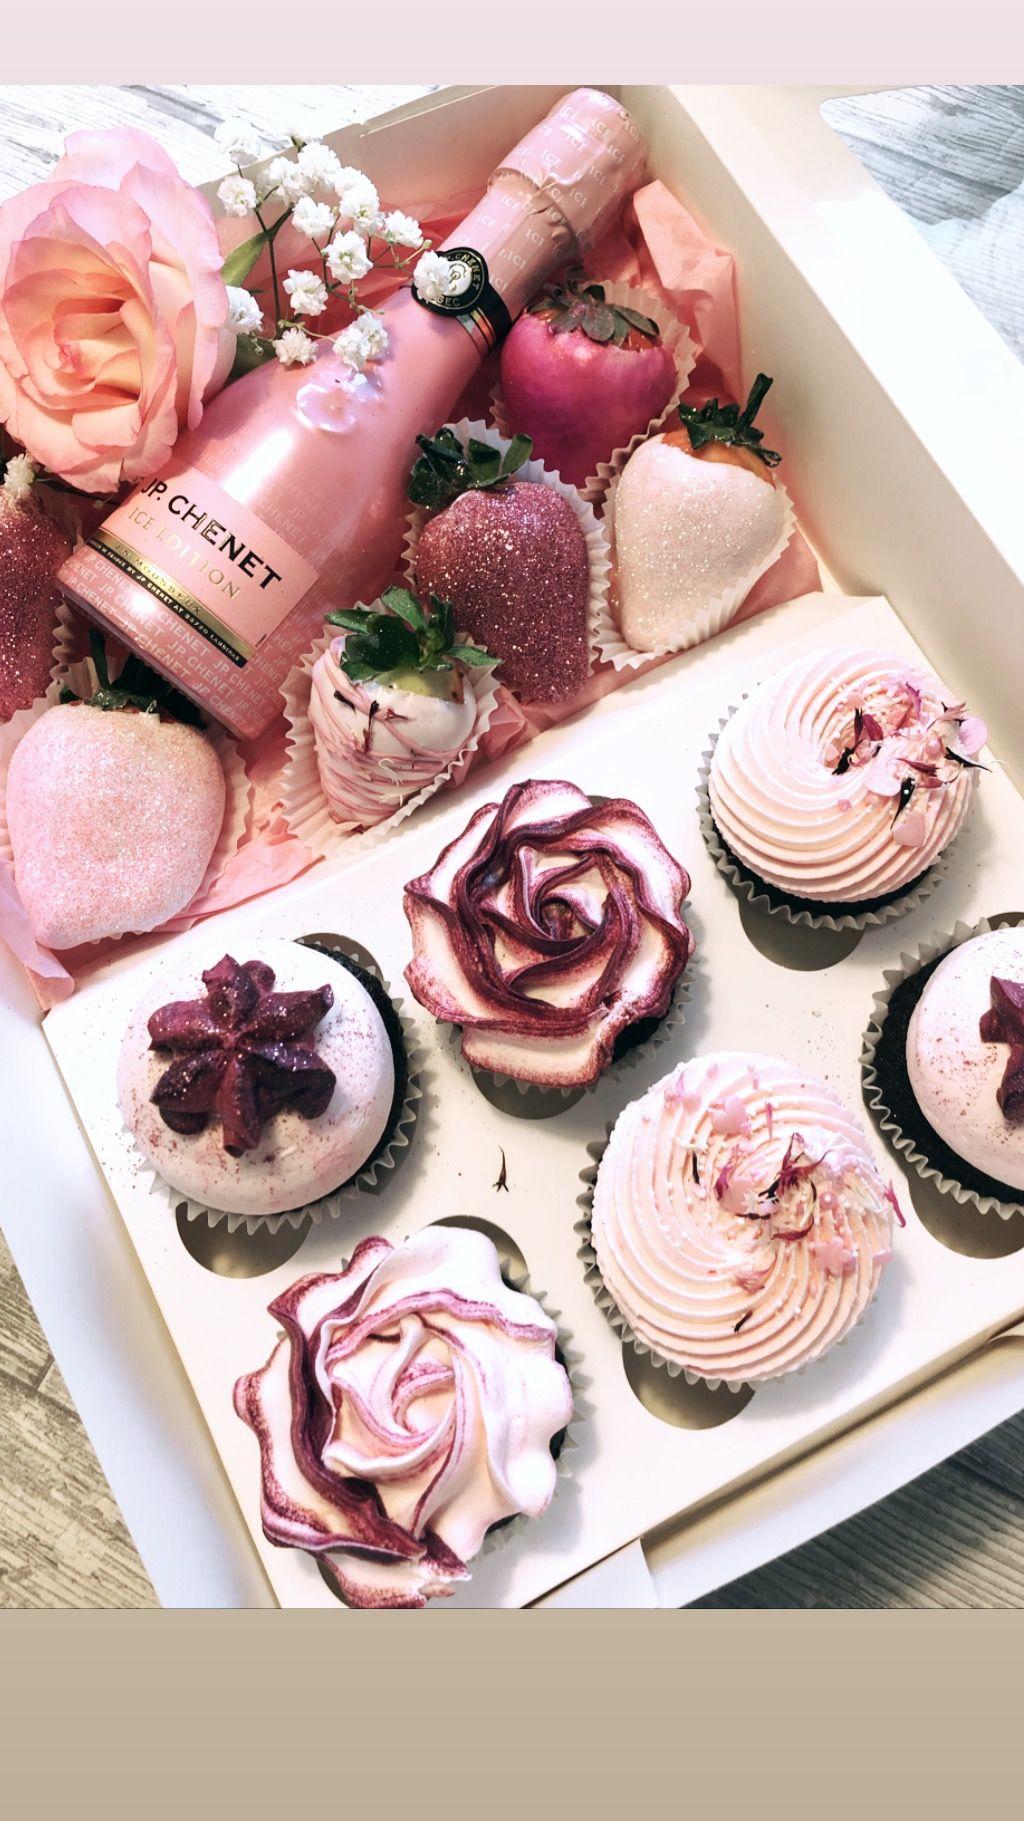 Cupcake gift box dessert gifts valentines baking gift